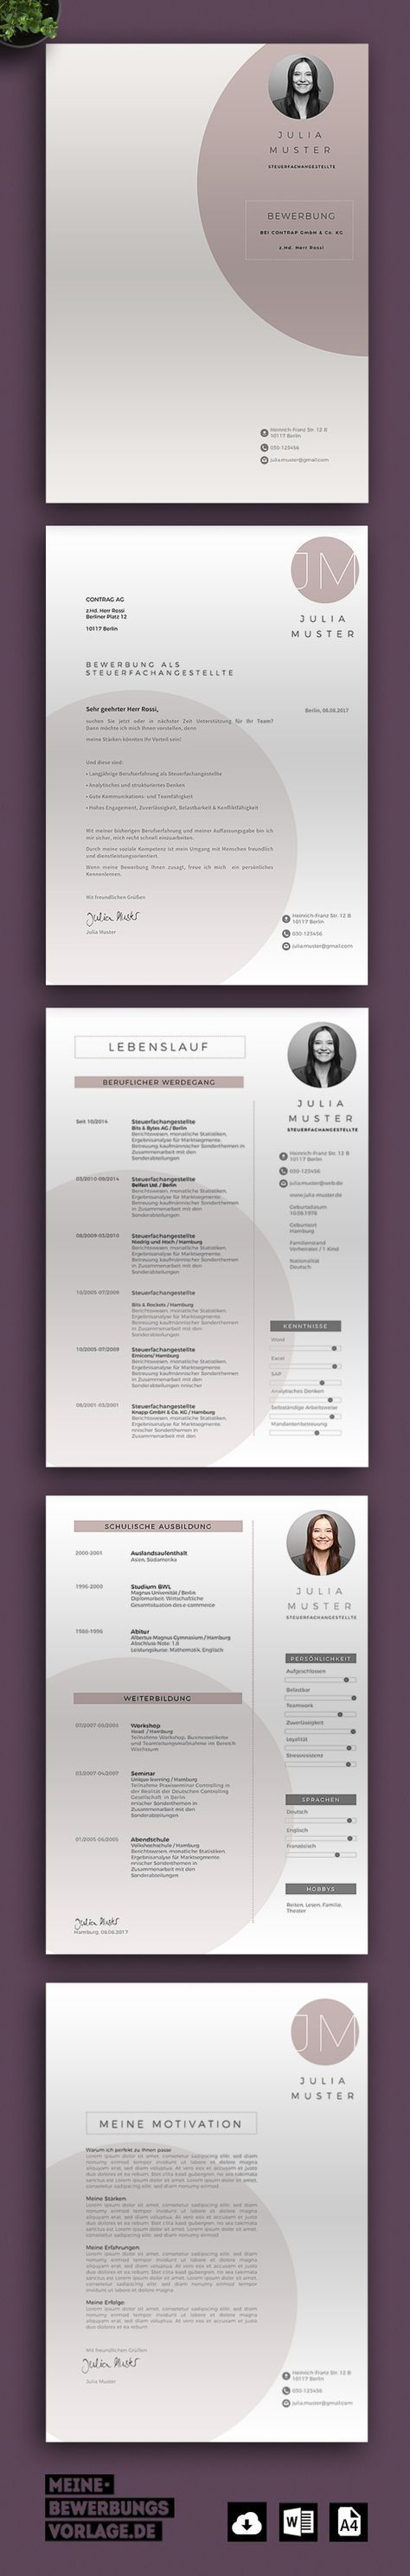 No. 7 #corporatedesign